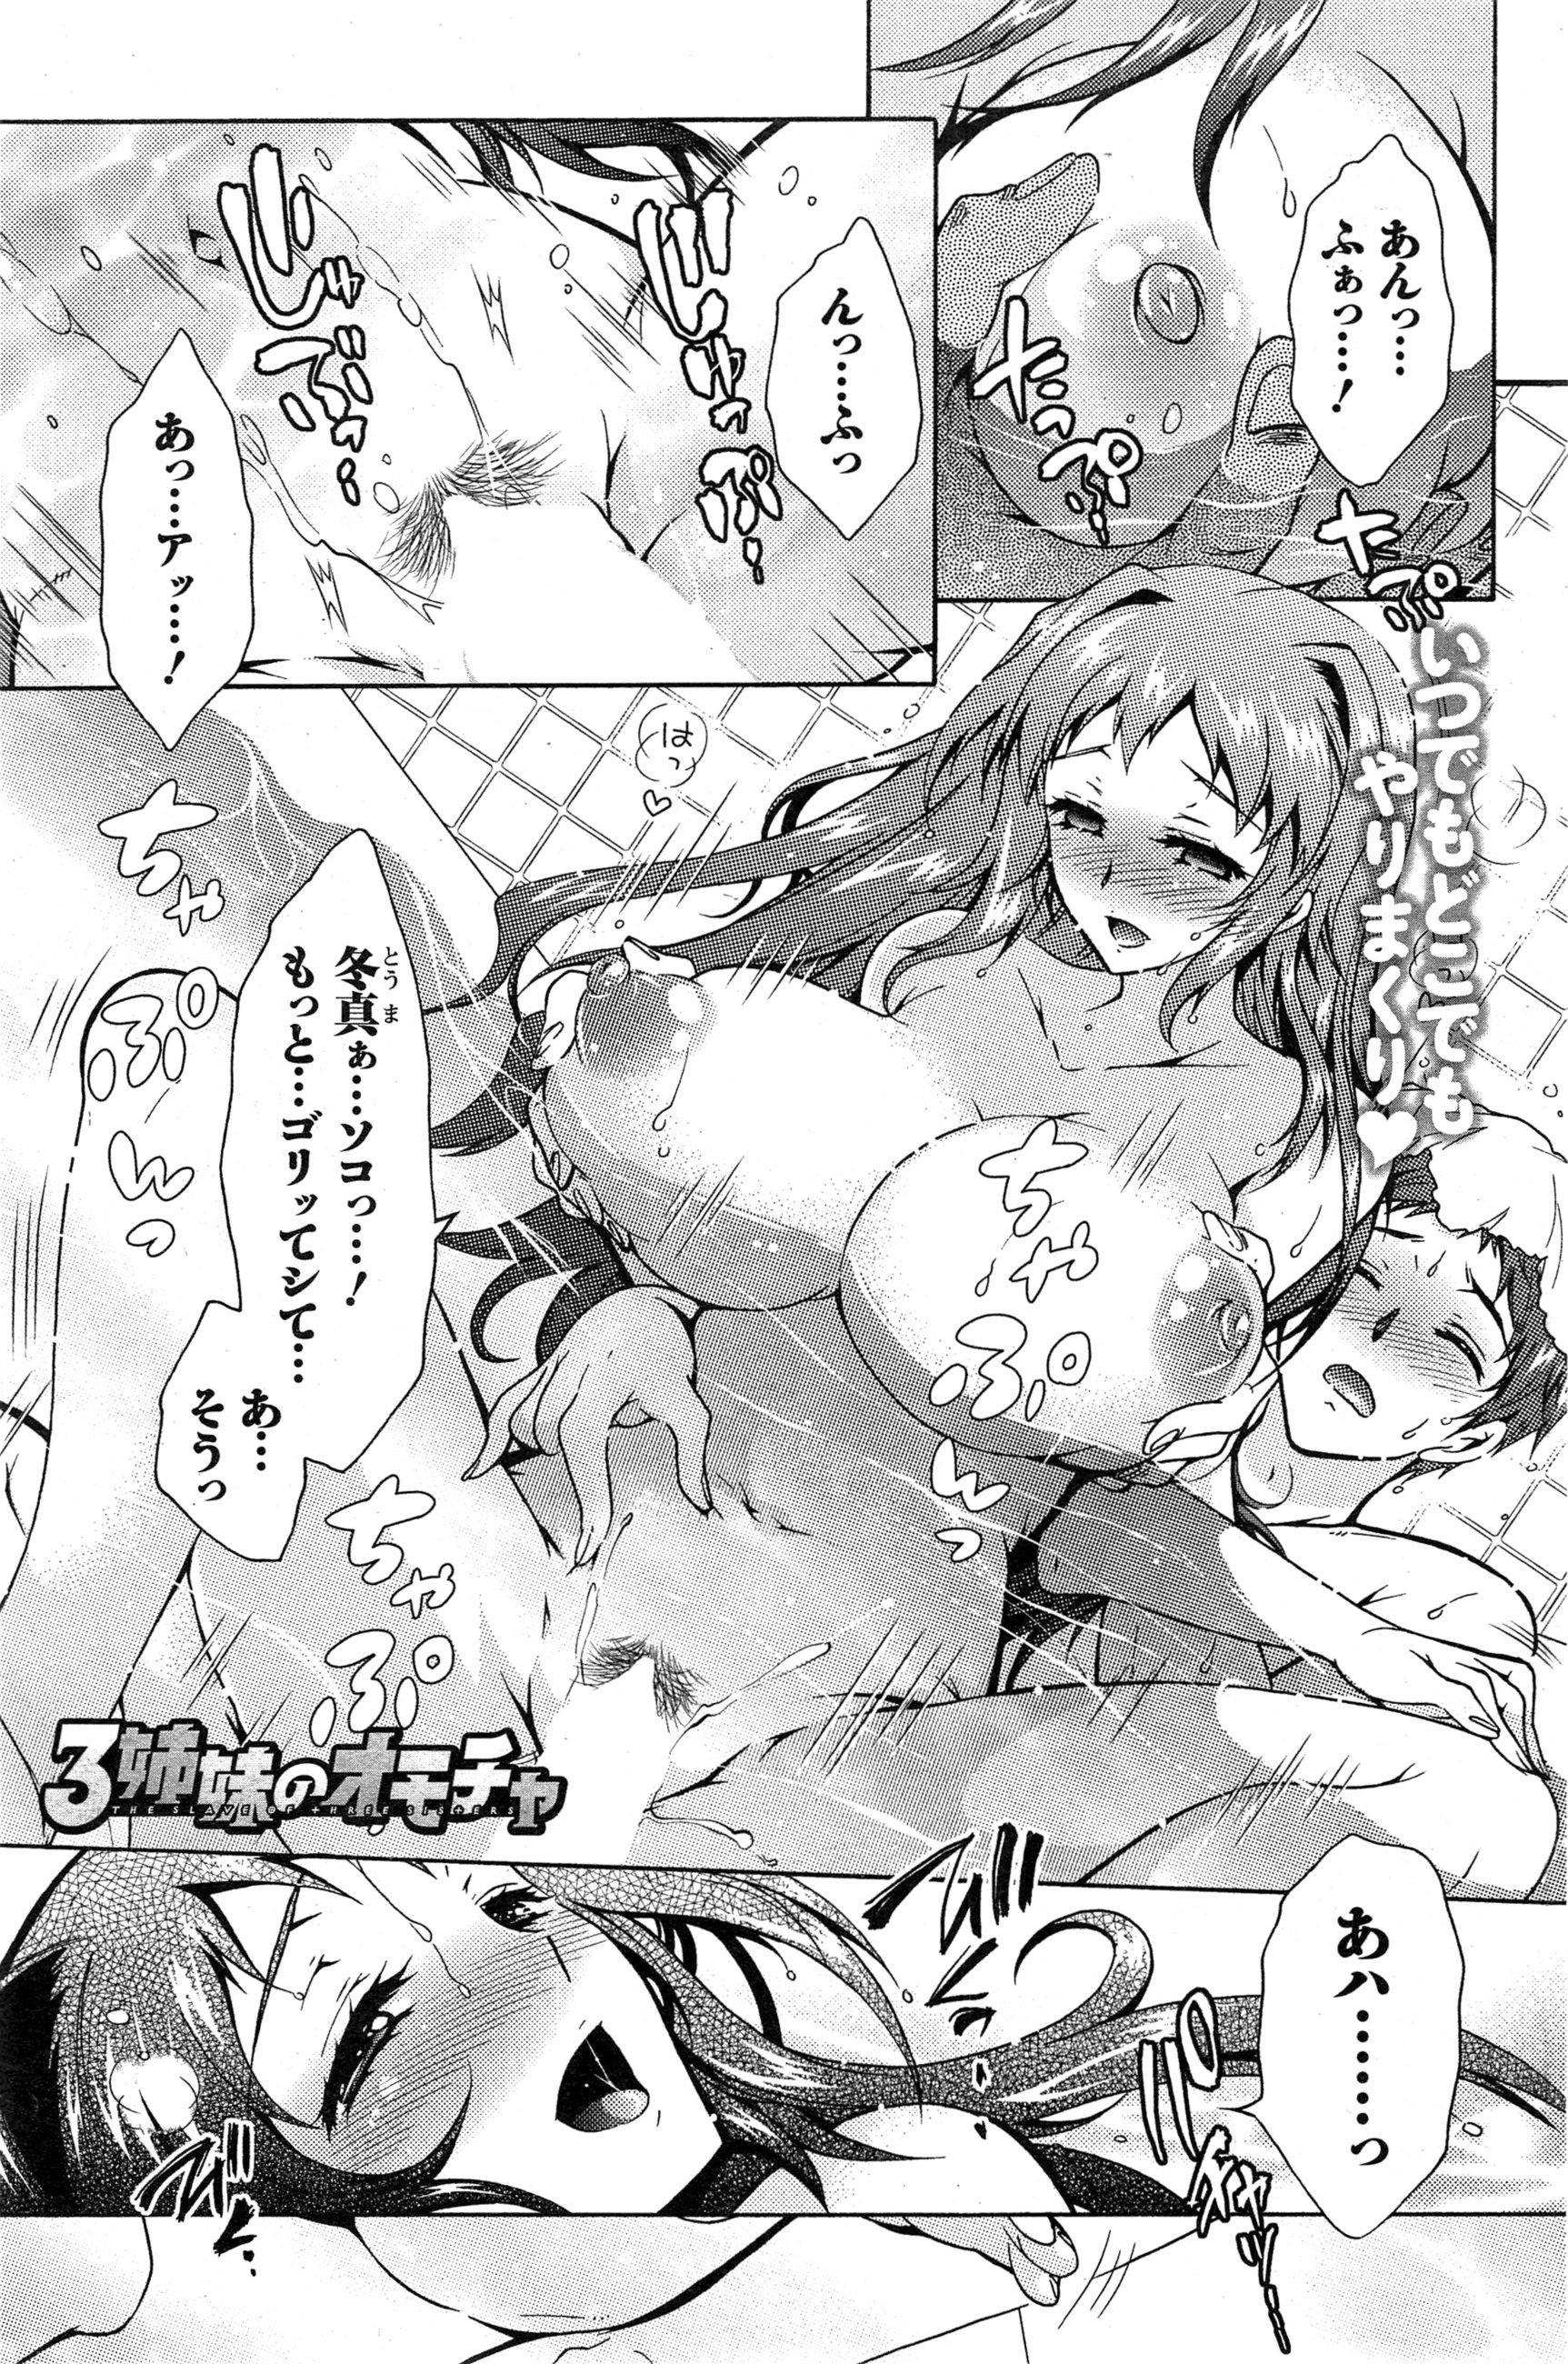 [Honda Arima] Sanshimai no Omocha - The Slave of Three Sisters Ch. 1-6 93